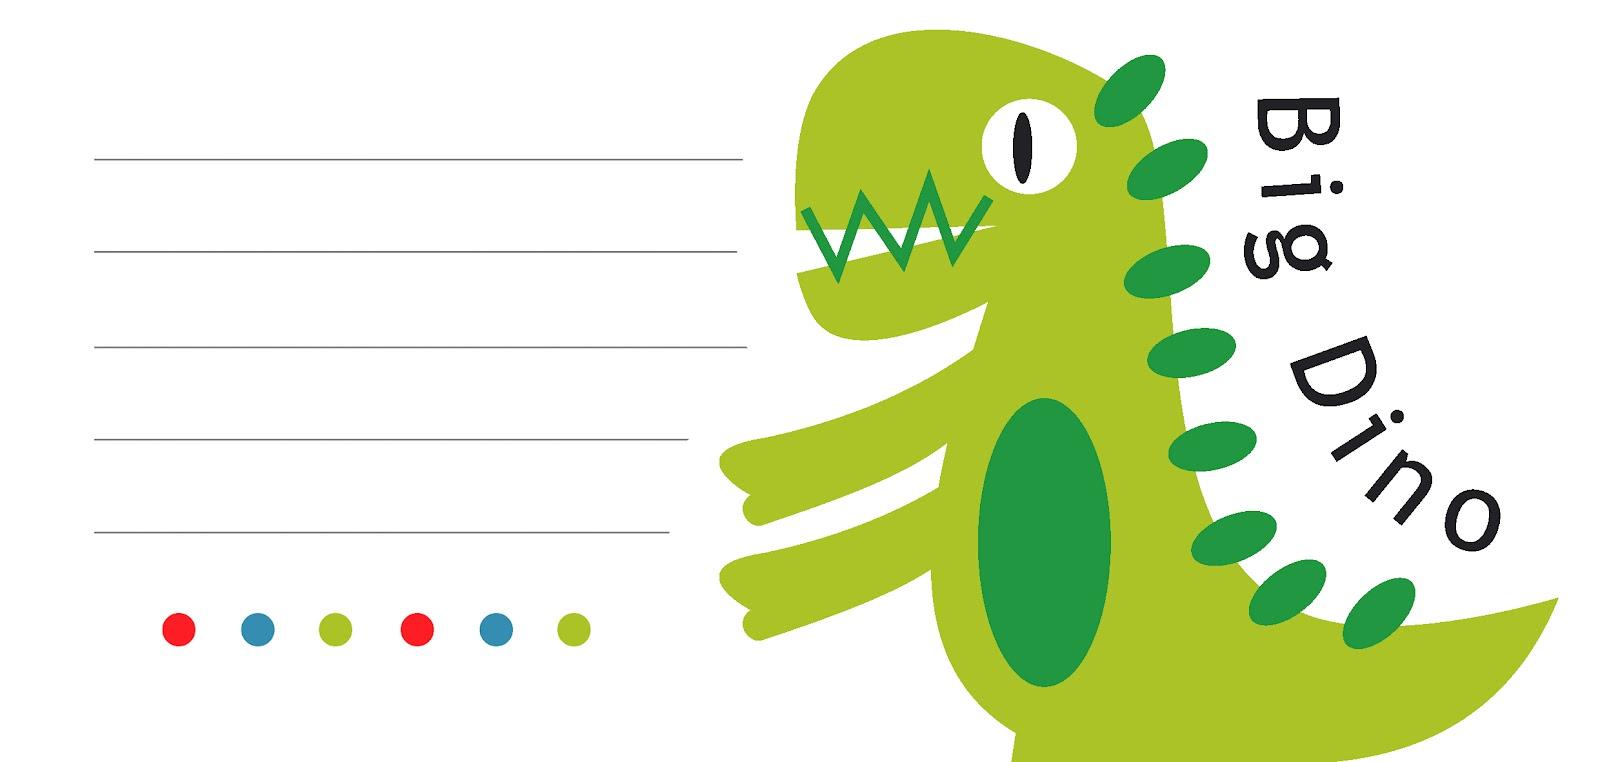 Party decora kit de cumplea os de dinosaurio dinosaurio - Cumpleanos de bebes ...